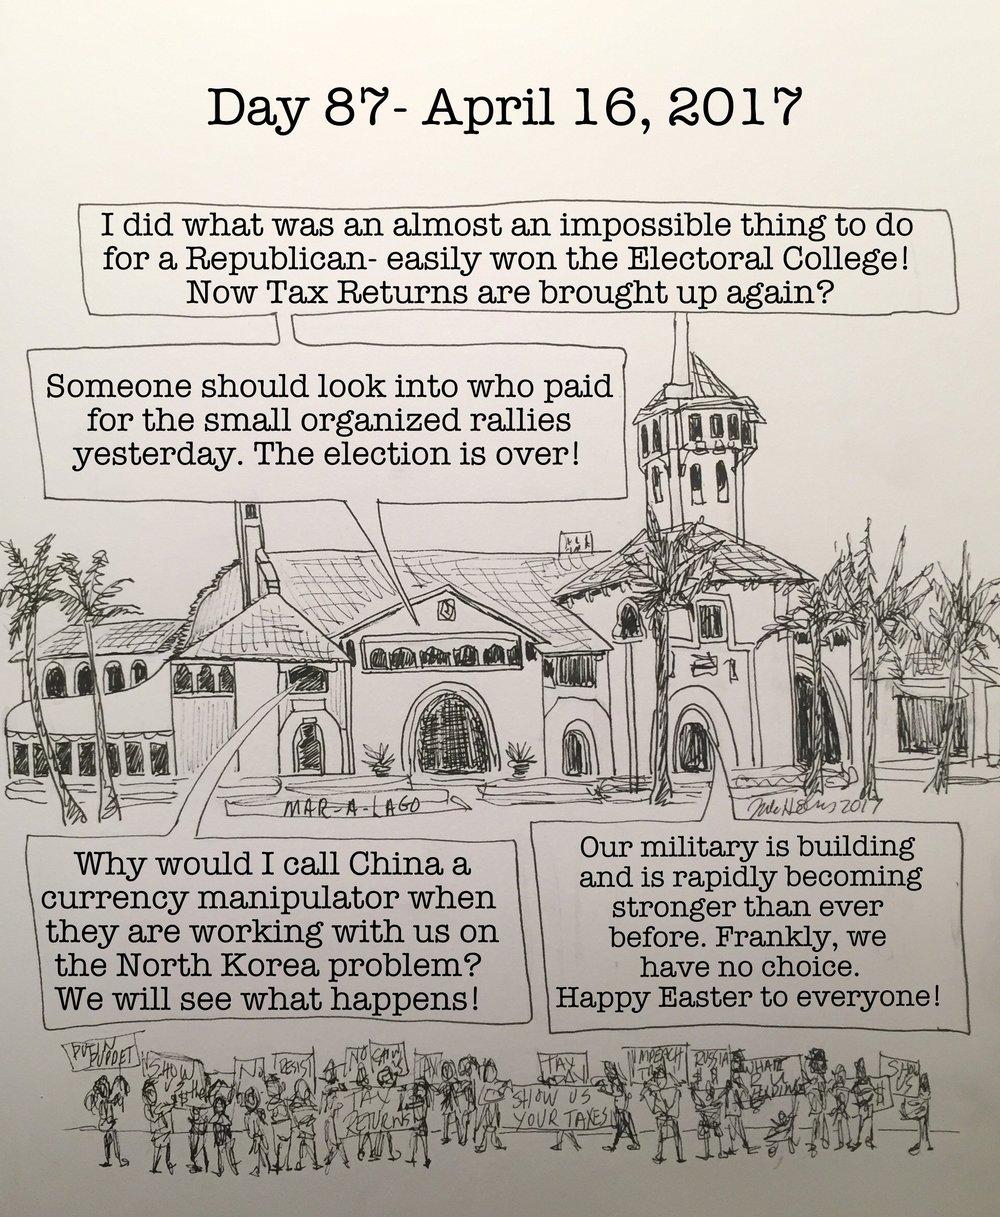 Day 87- April 16, 2017